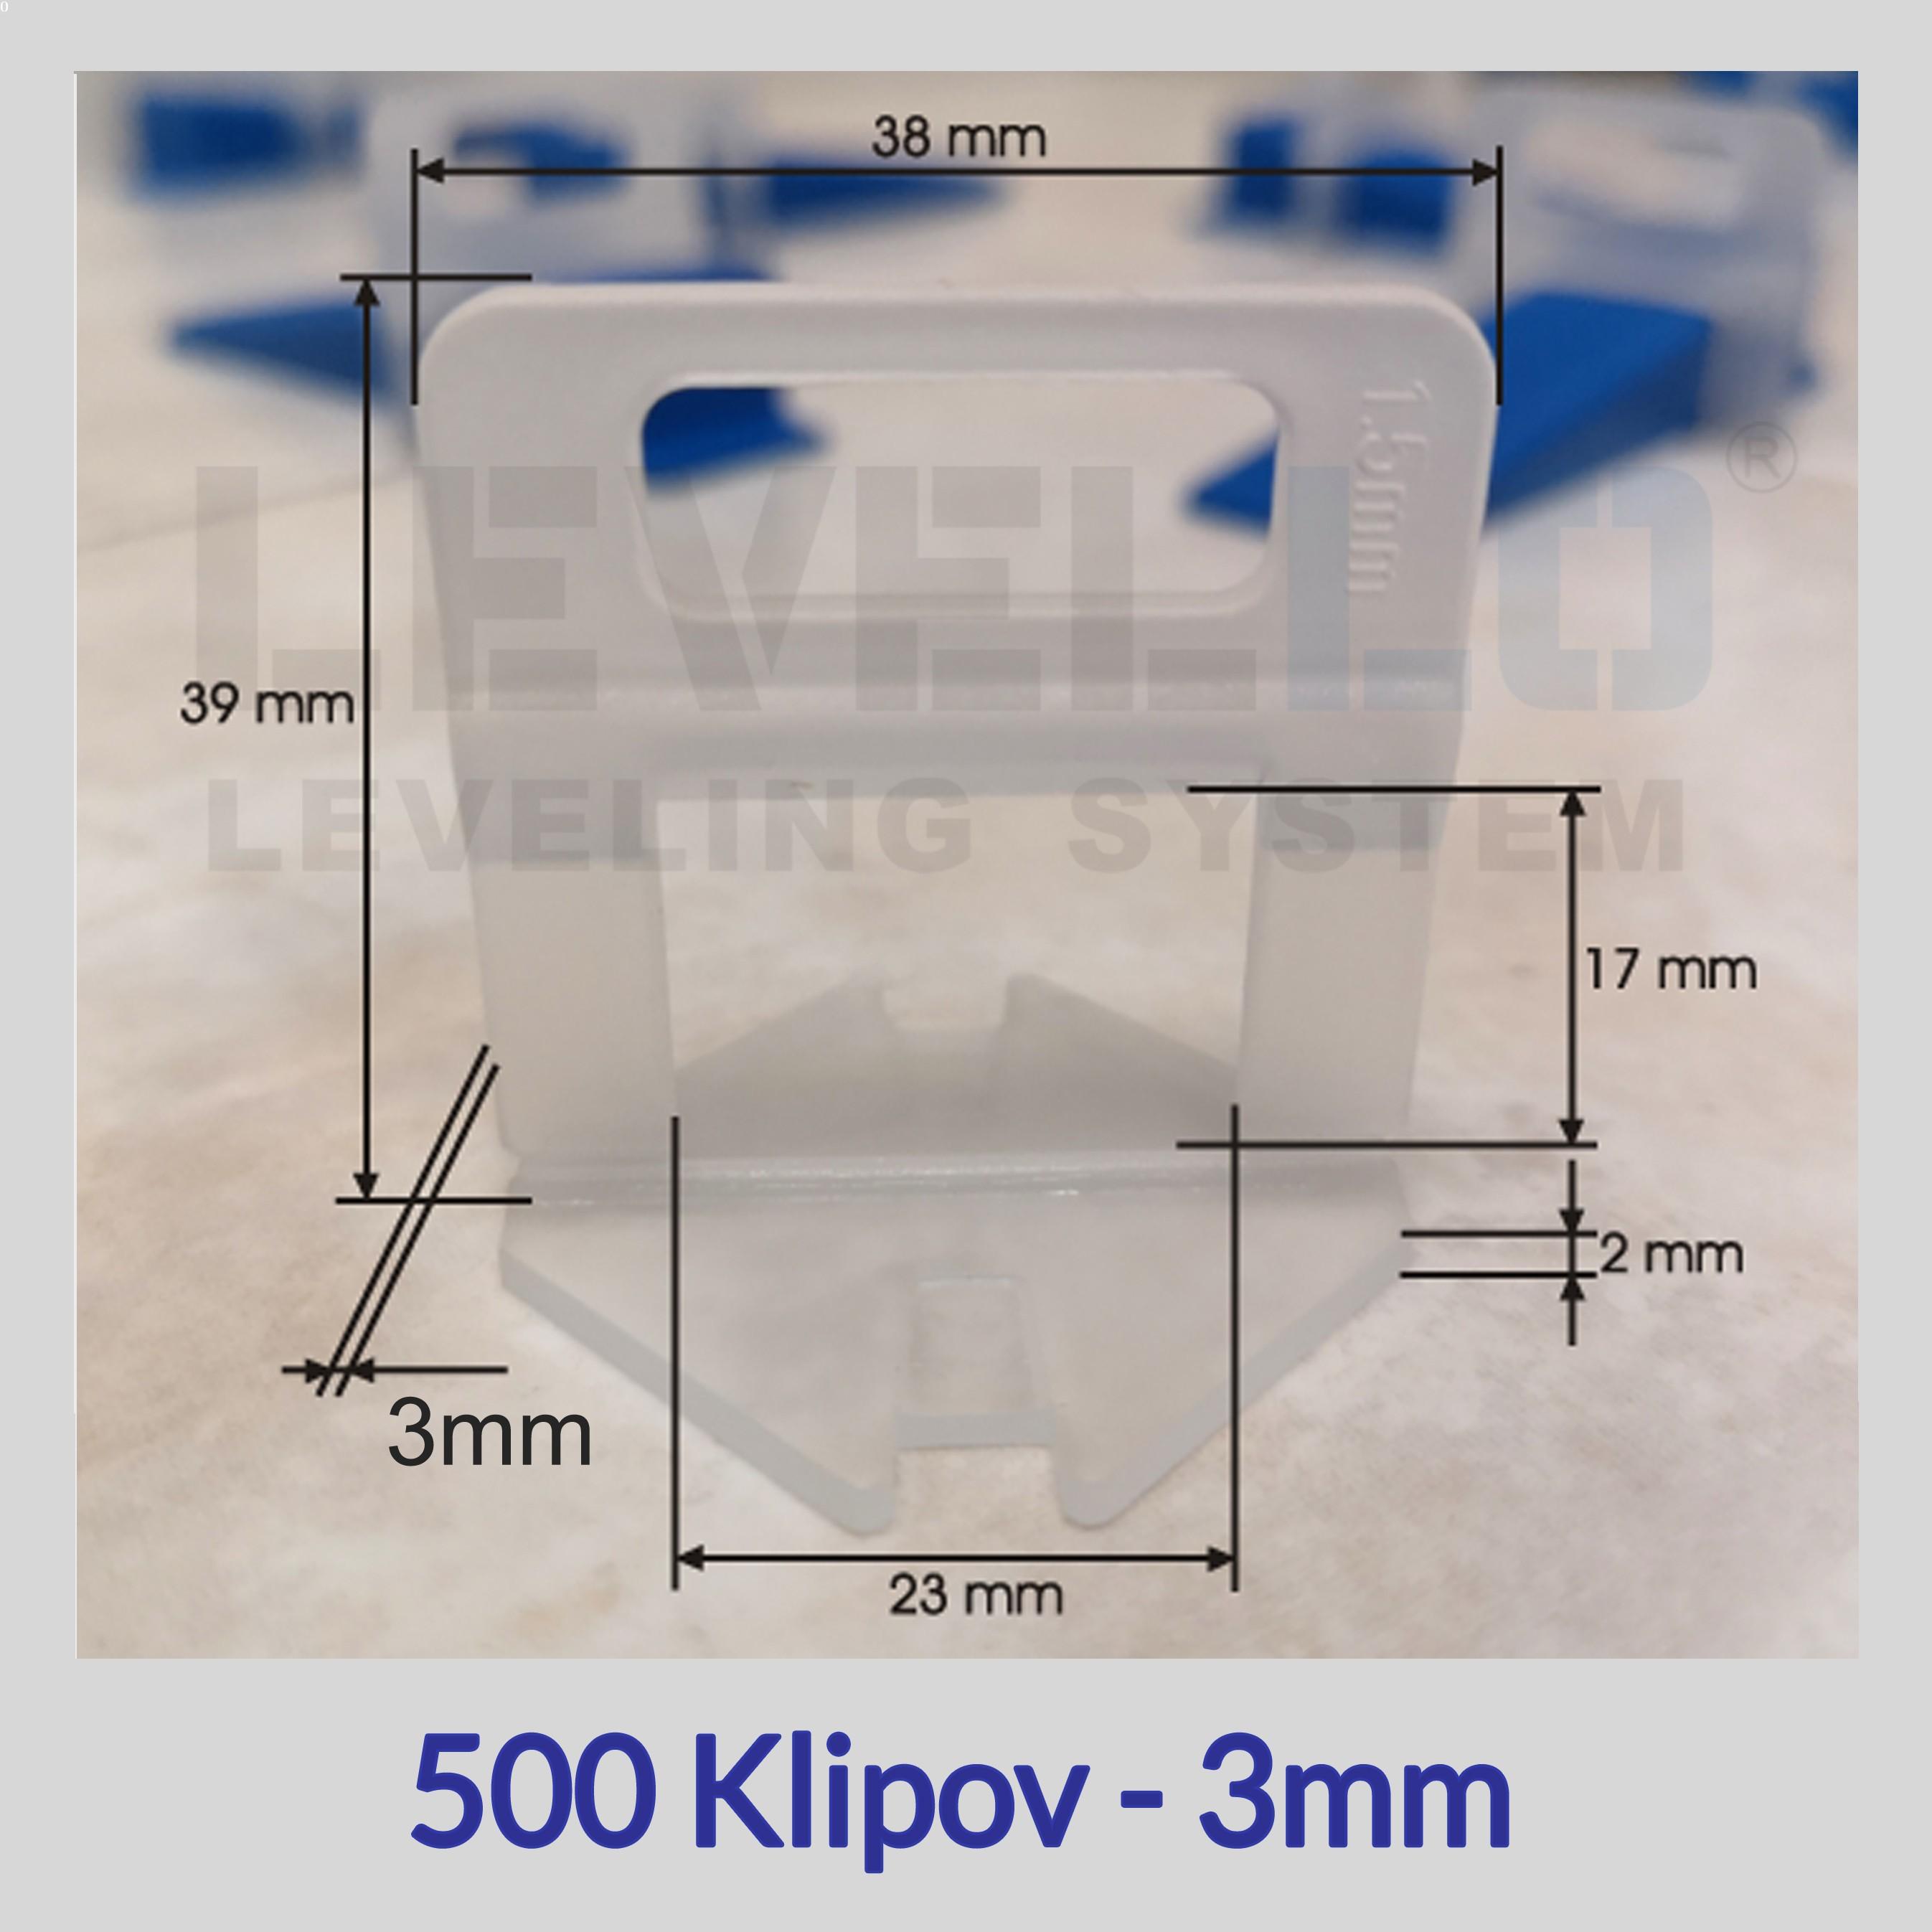 Klipy Eko LEVELLO ® 3 mm, 500 kusov